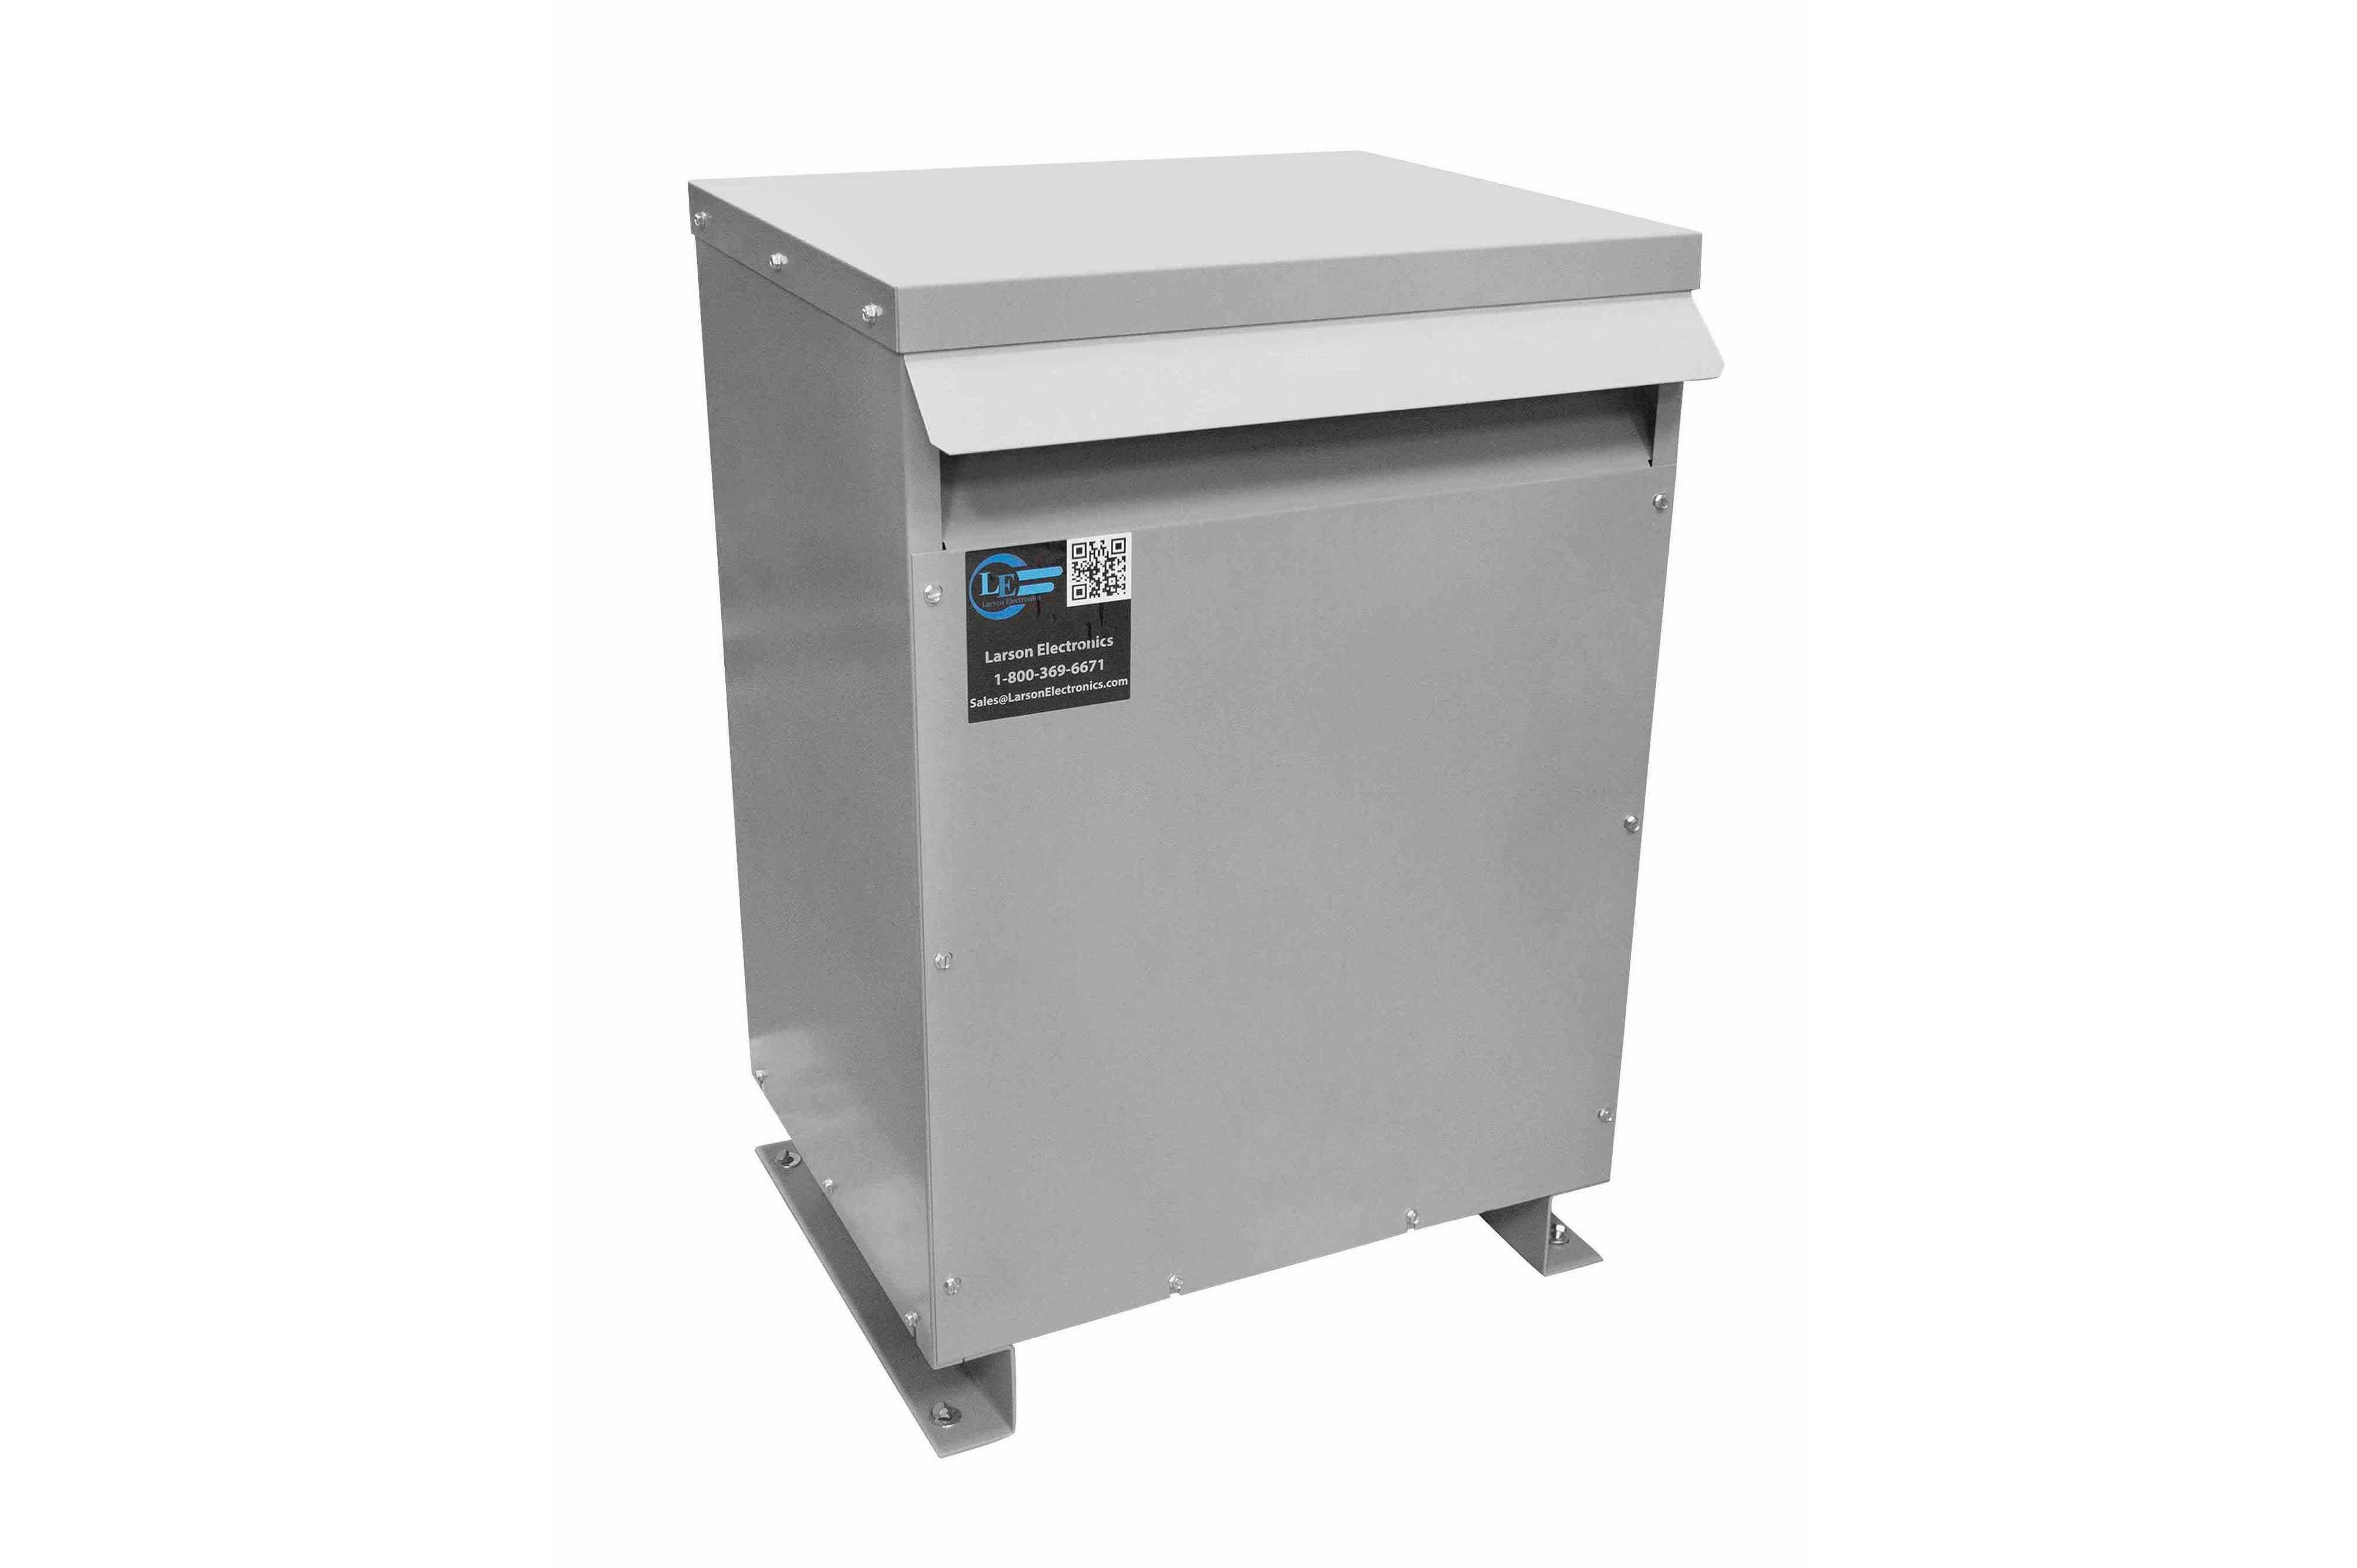 47.5 kVA 3PH Isolation Transformer, 208V Wye Primary, 240V Delta Secondary, N3R, Ventilated, 60 Hz